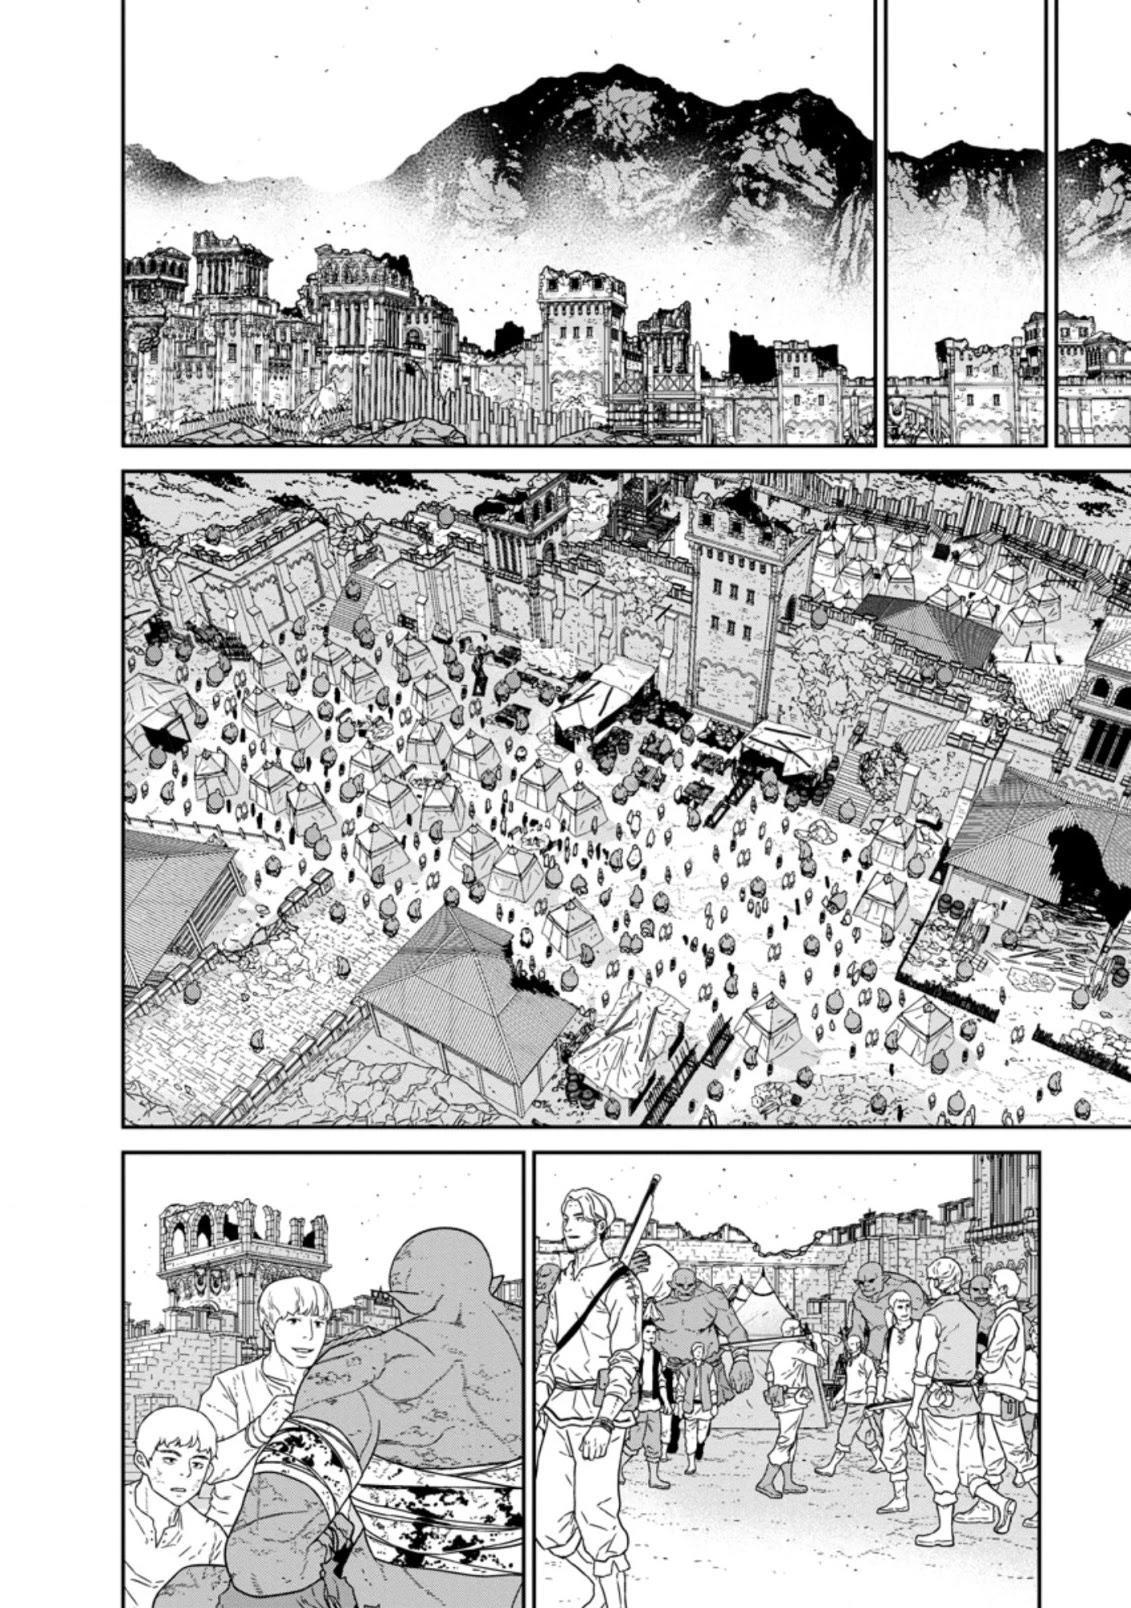 Maou Gun Saikyou No Majutsushi Wa Ningen Datta Chapter 19.1 page 5 - Mangakakalots.com